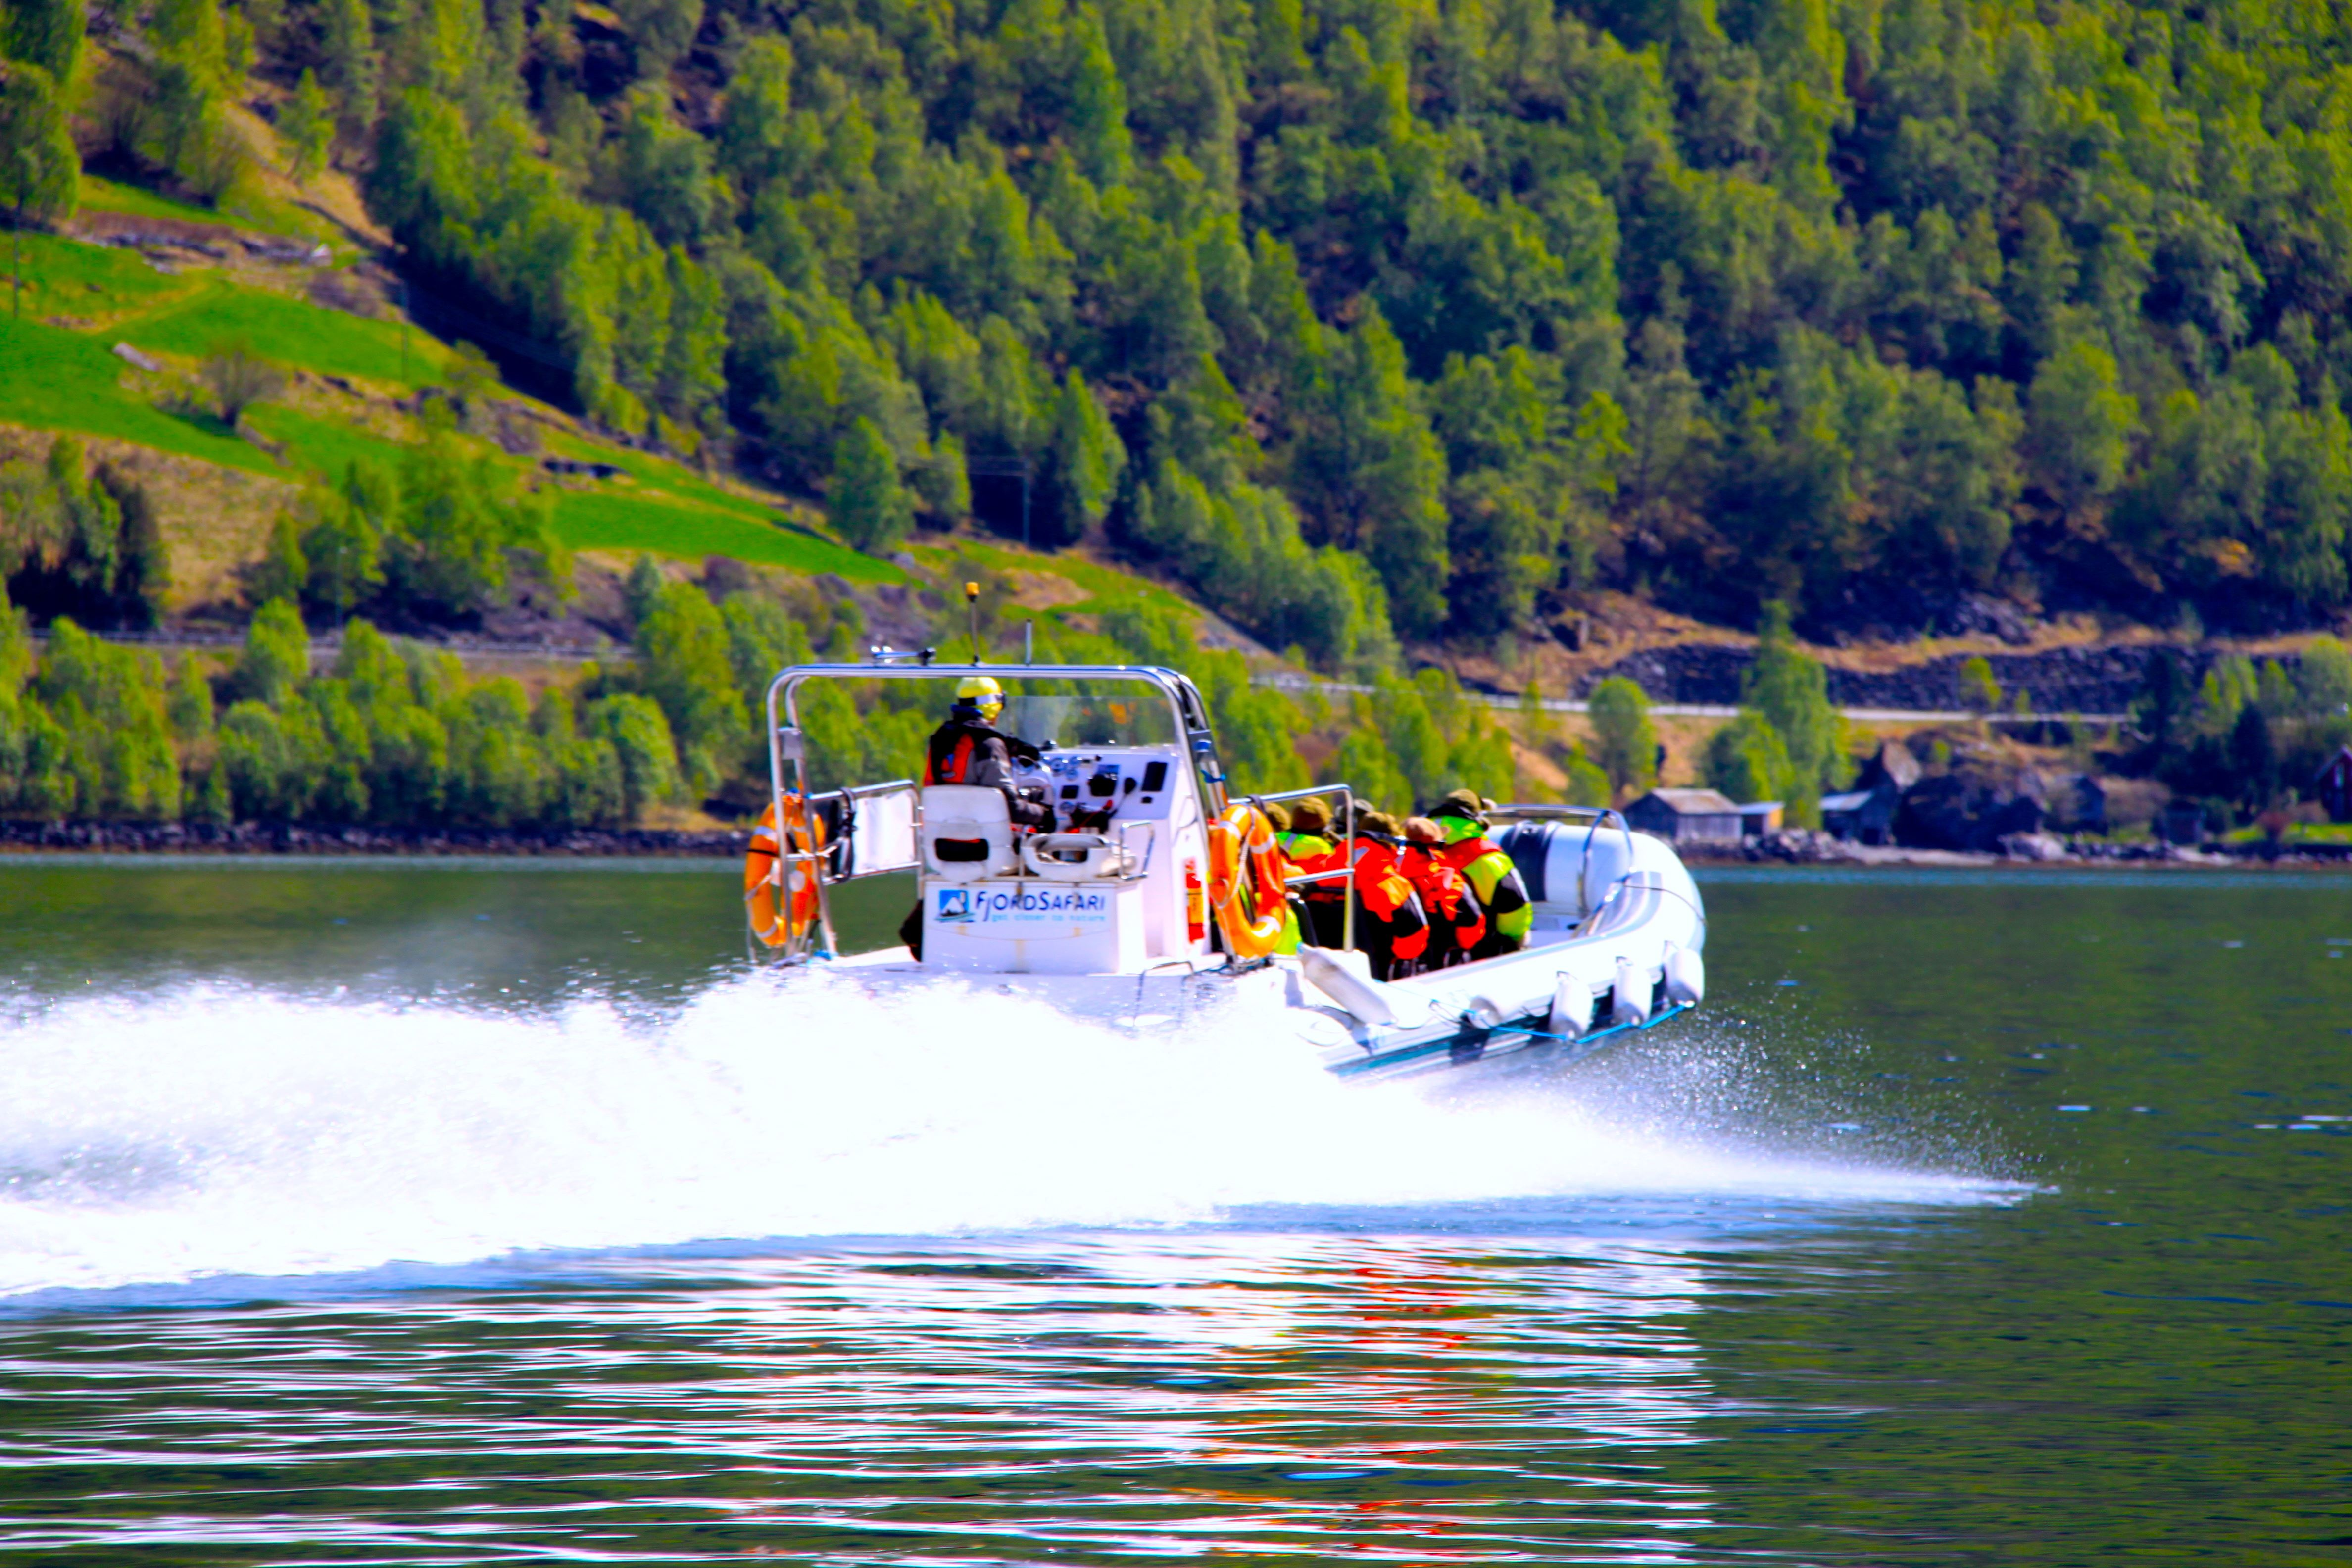 Eirik Østerli, Basic FjordSafari